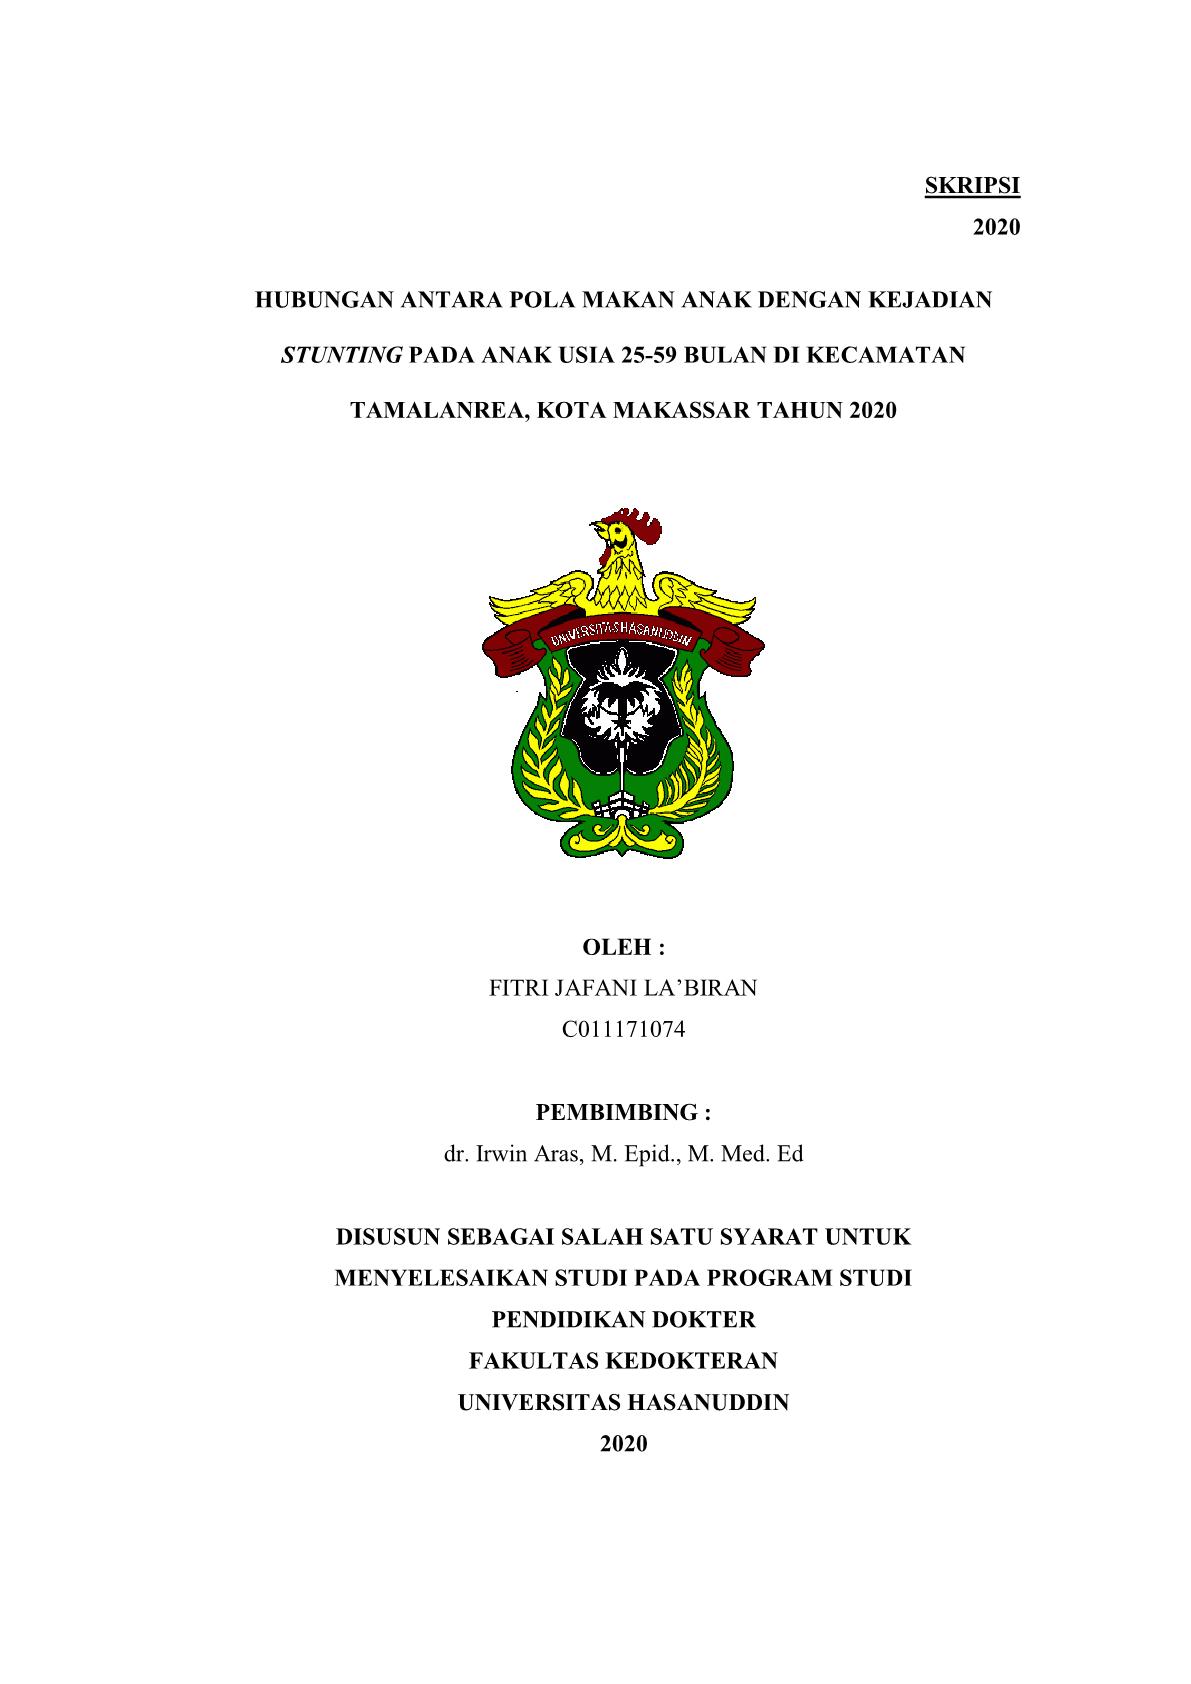 Hubungan Antara Pola Makan Anak Dengan Kejadian Stunting Pada Anak Usia 25 59 Bulan Di Kecamatan Tamalanrea Kota Makassar Tahun 2020 Repository Universitas Hasanuddin